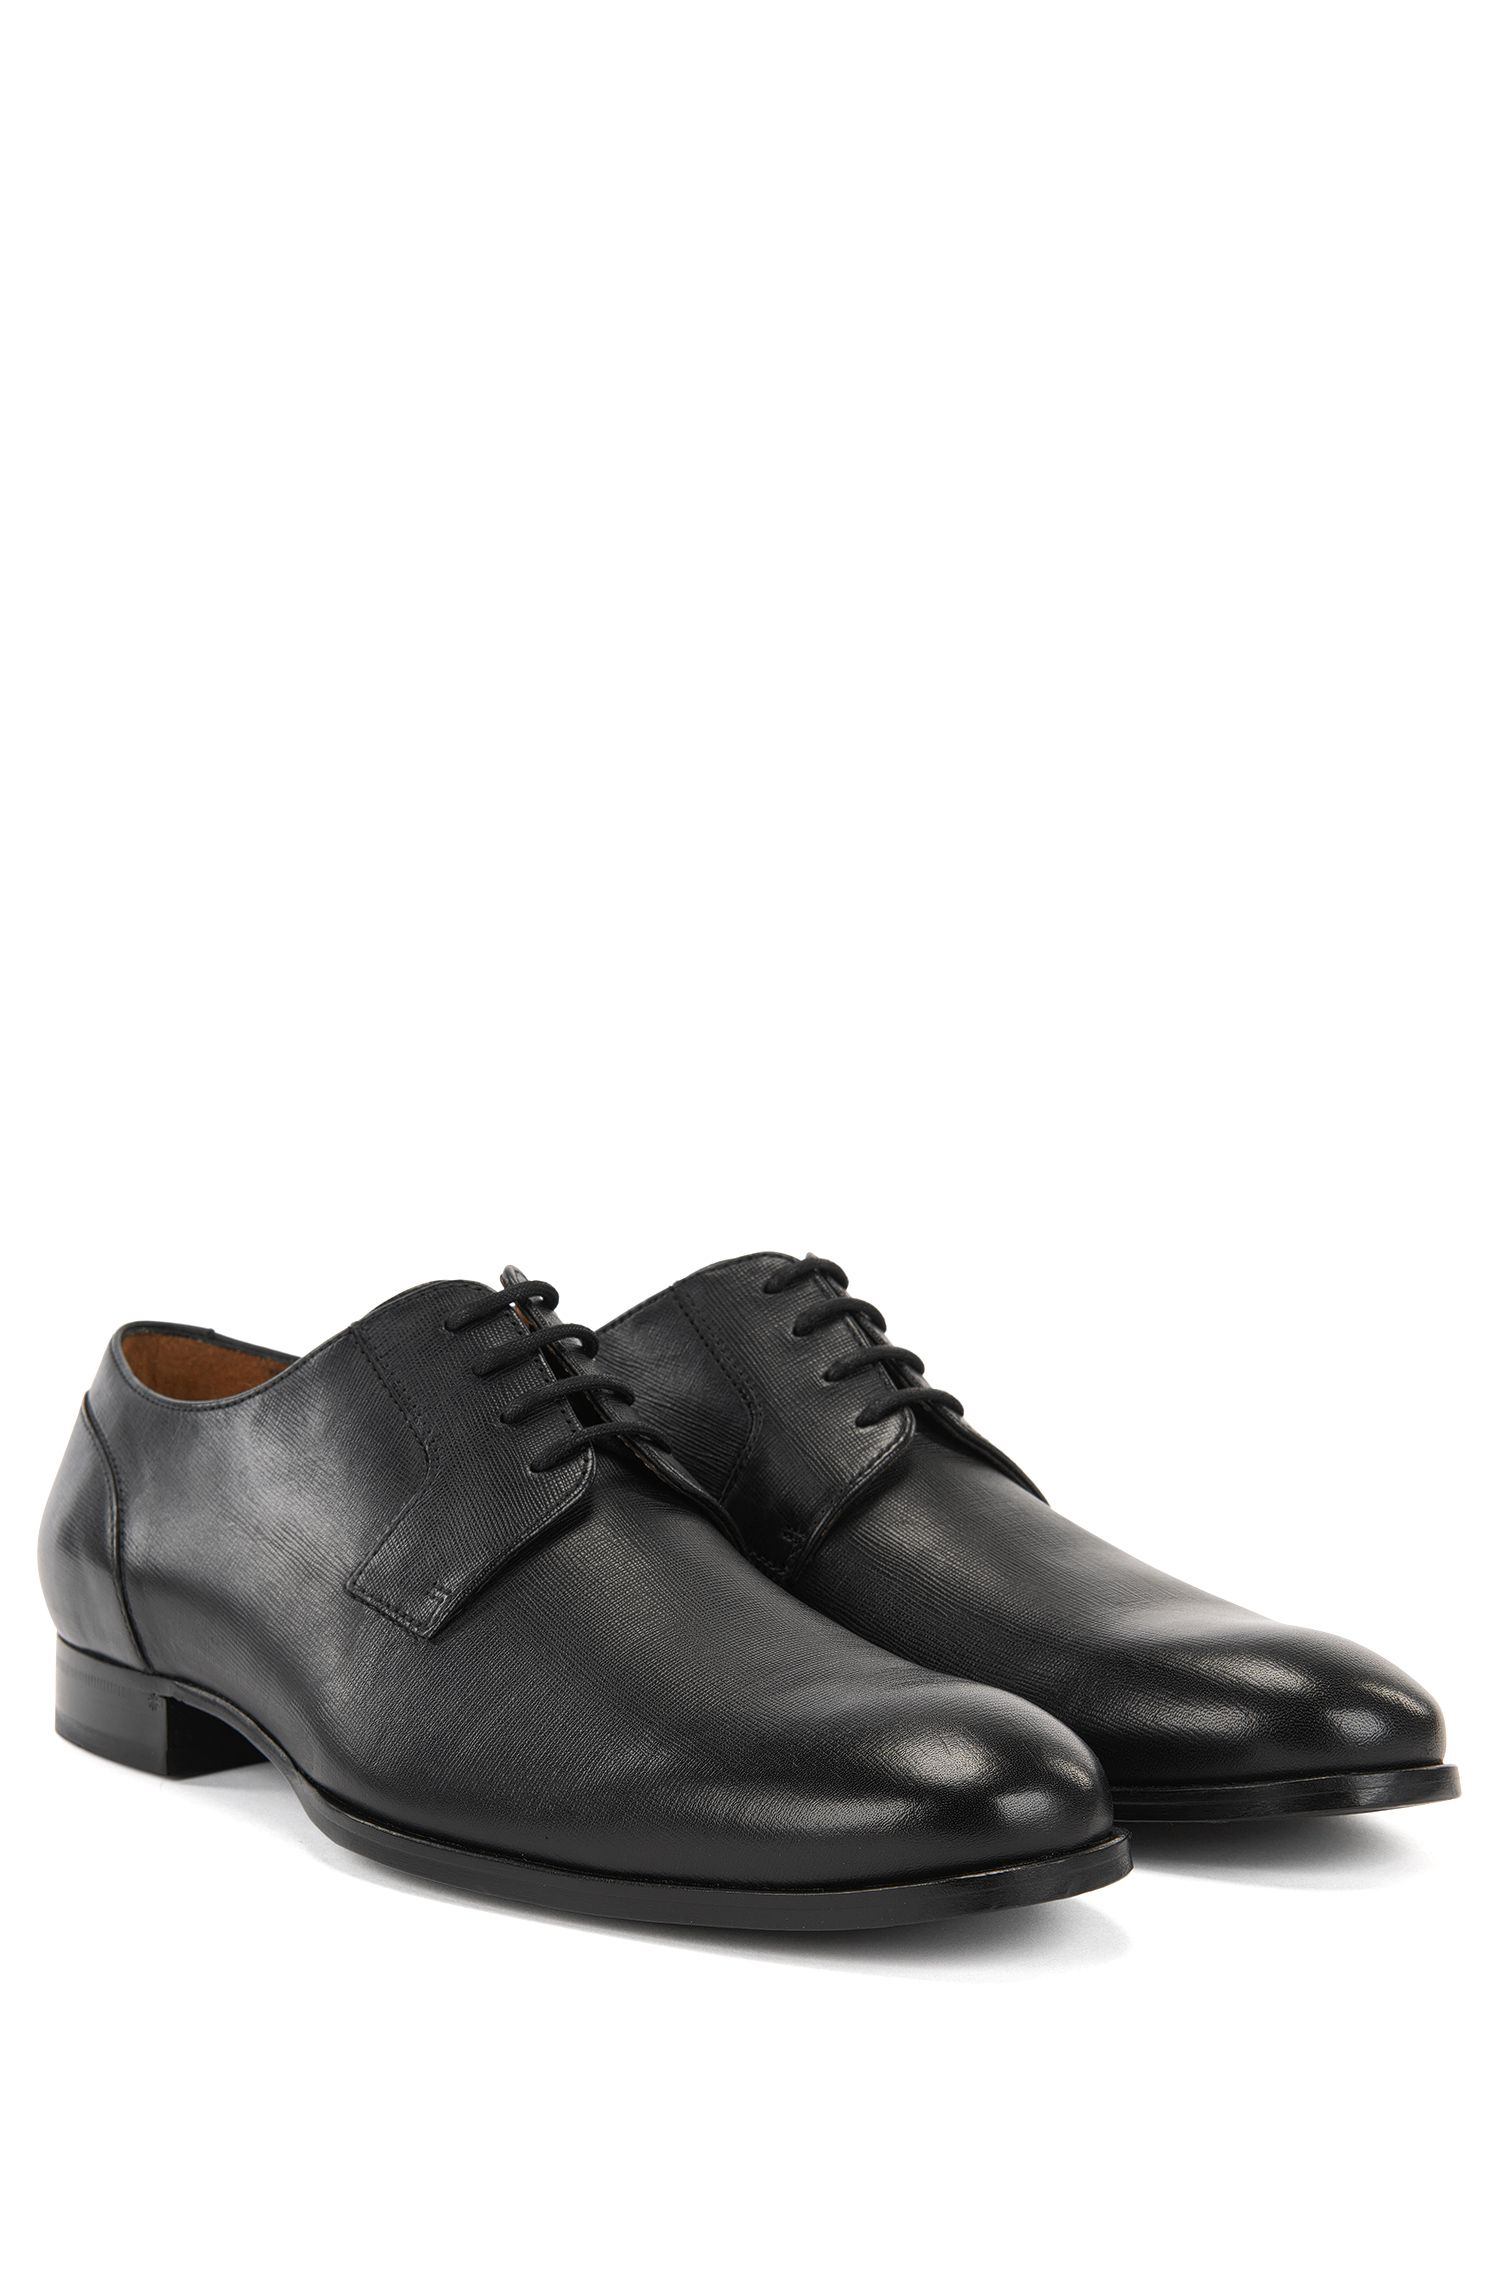 Italian Leather Derby Dress Shoe | Hannover Derb Pr